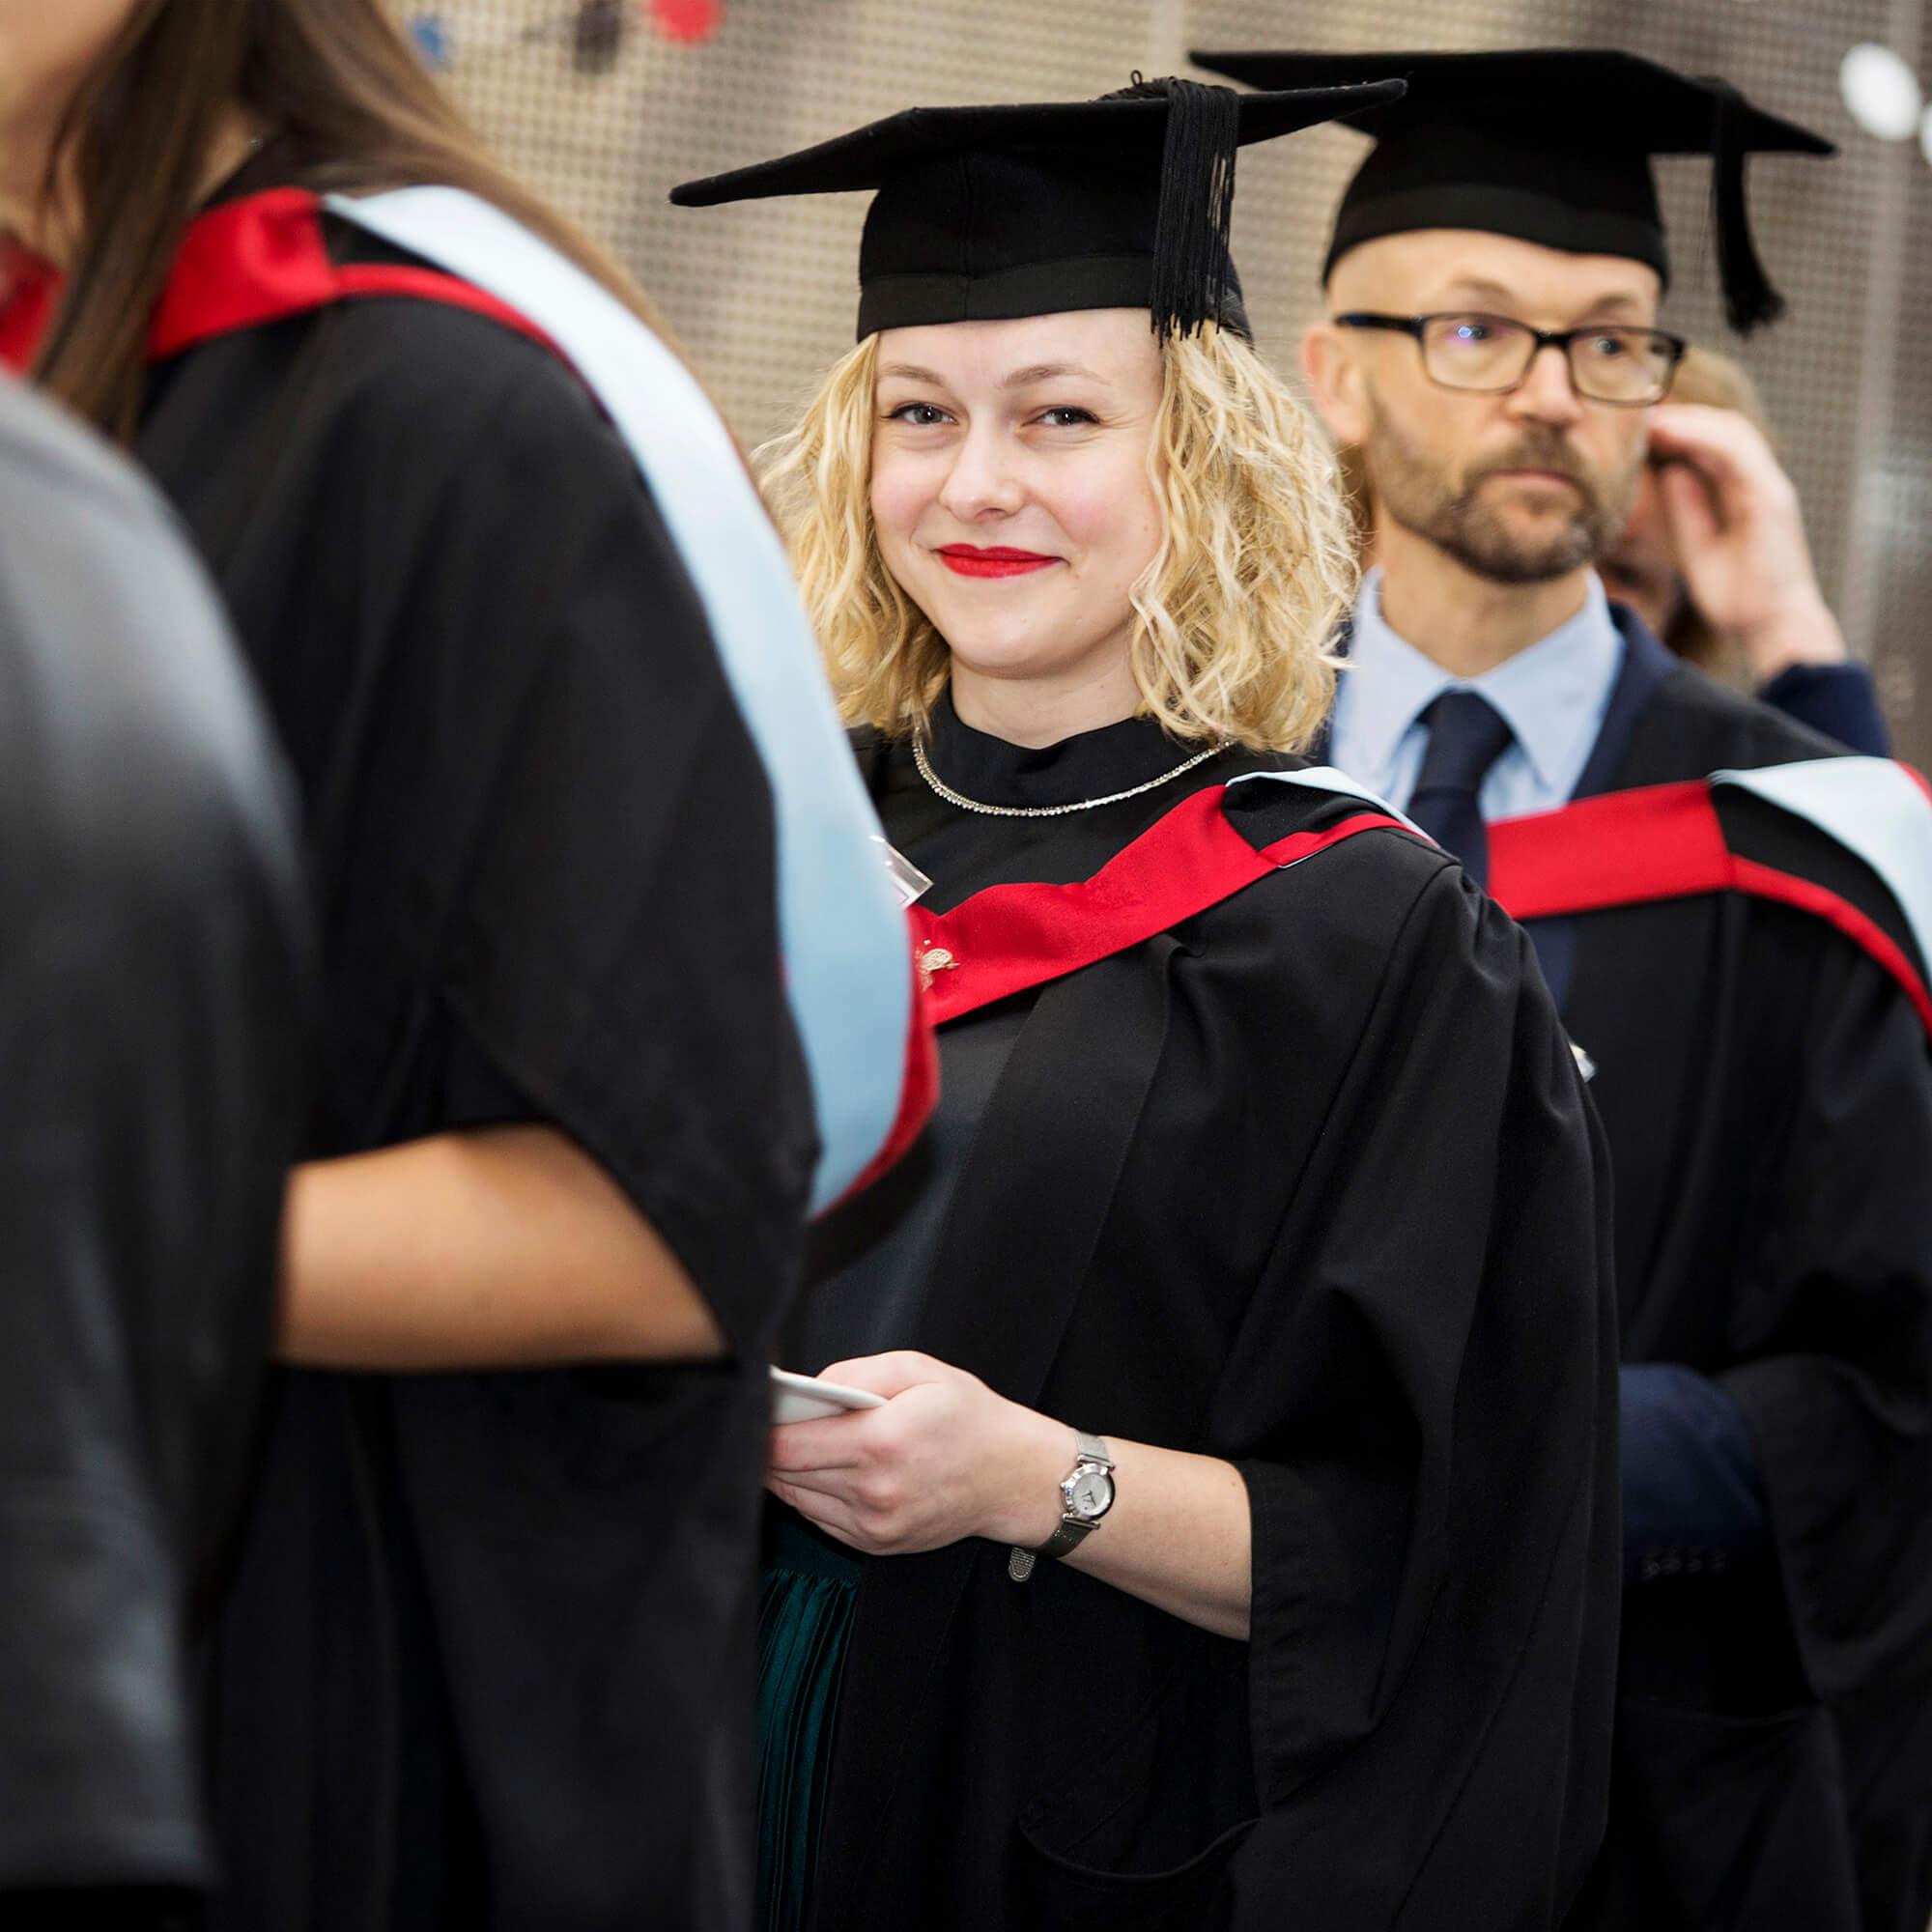 Philippa Tredget at her graduation reception